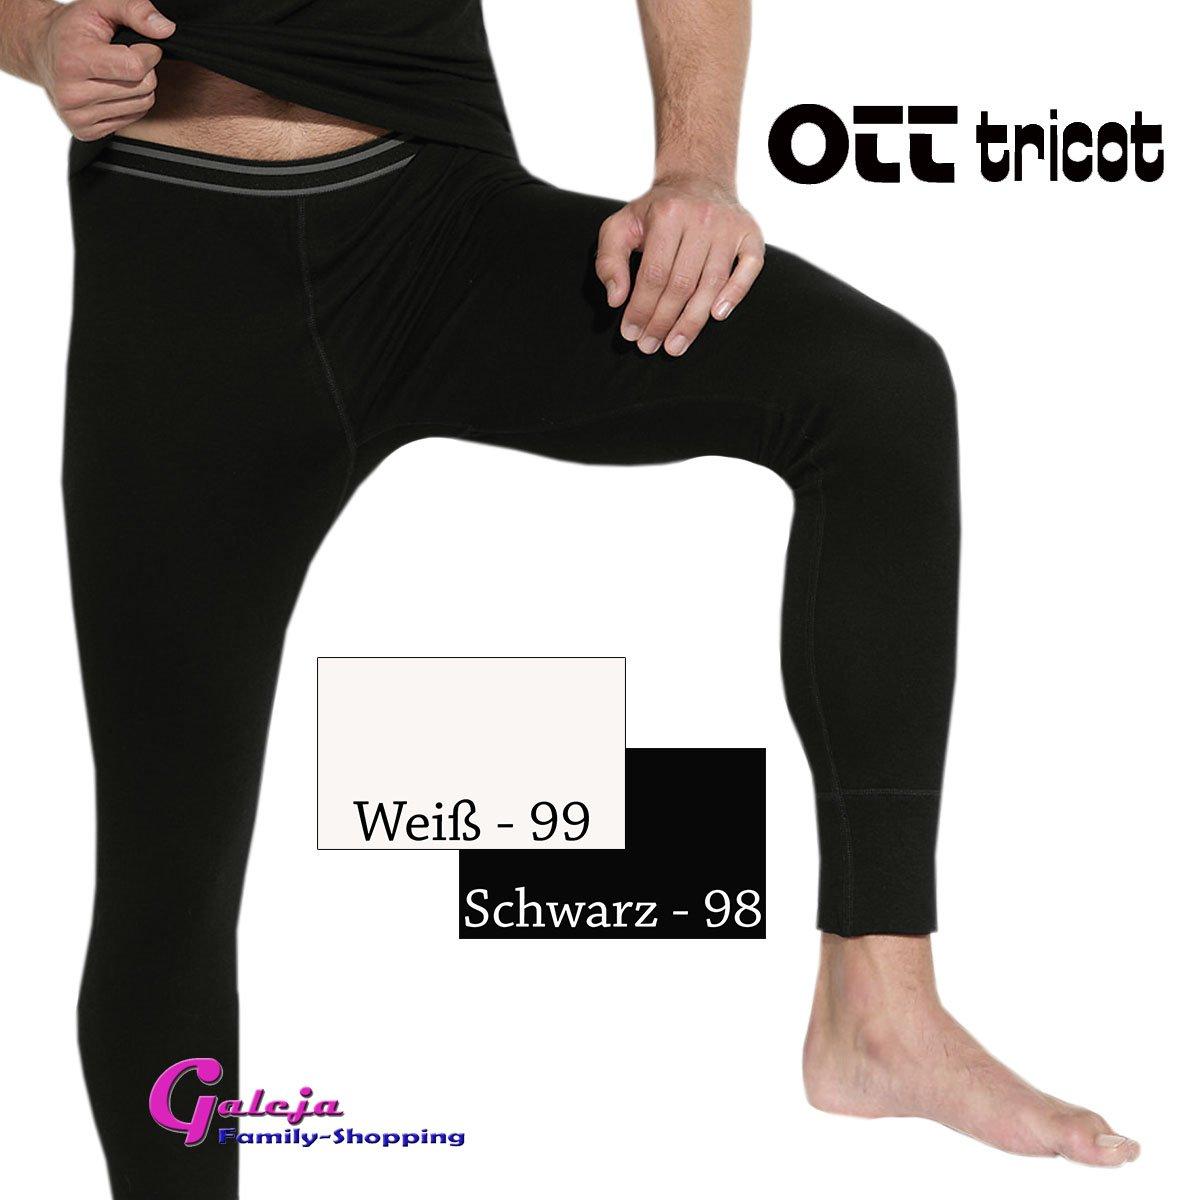 M-XXXL Ott-tricot Herren Funktionsw/äsche Unterhose lang LEMA Therm 2 Farben Gr